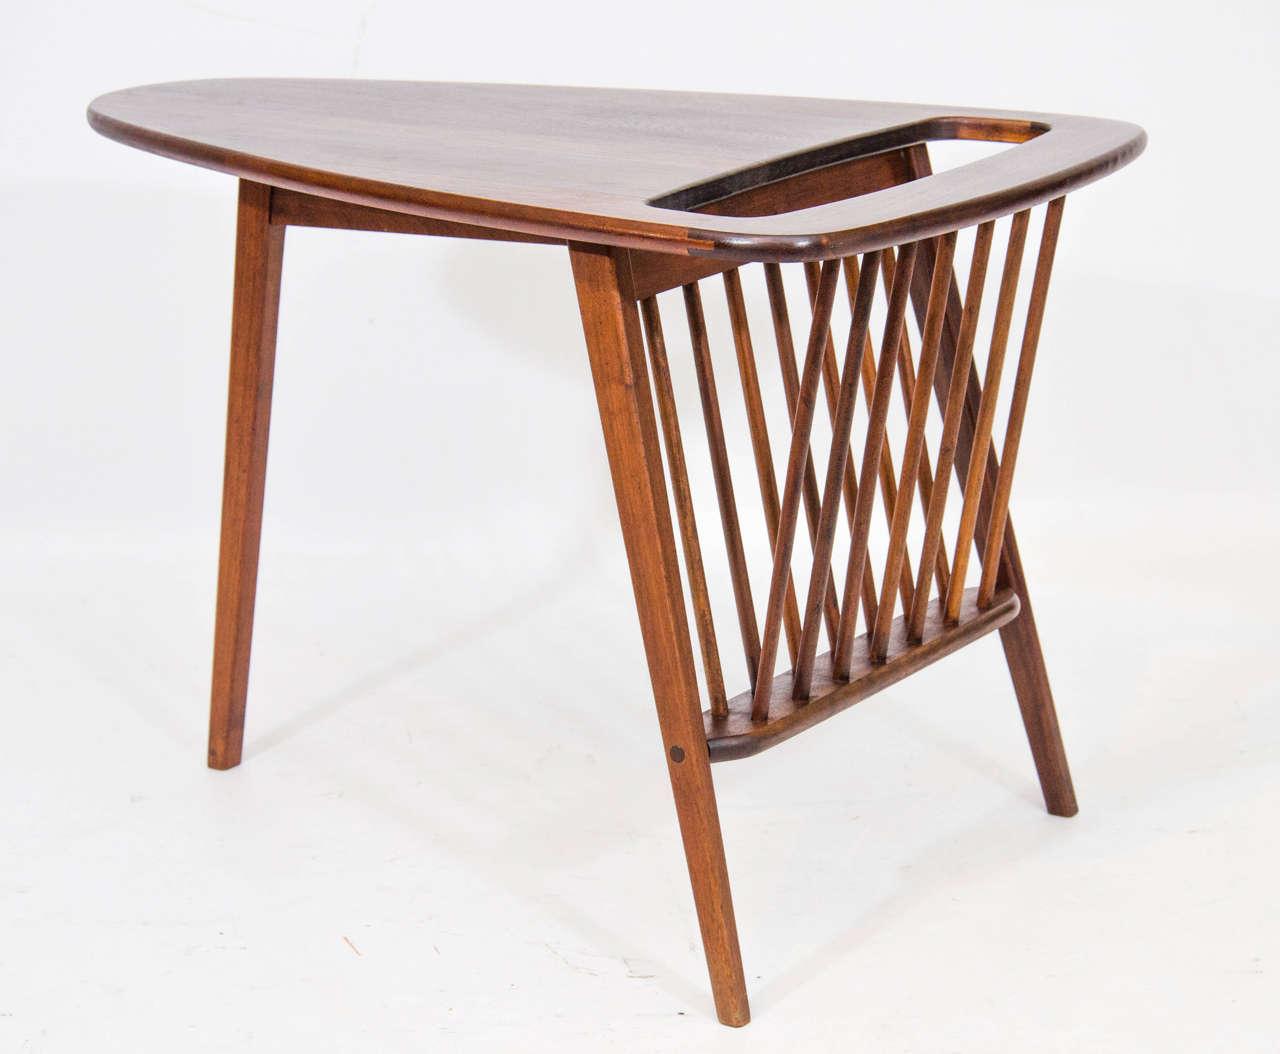 Side Table Or Magazine Rack By Arthur Umanoff At 1stdibs